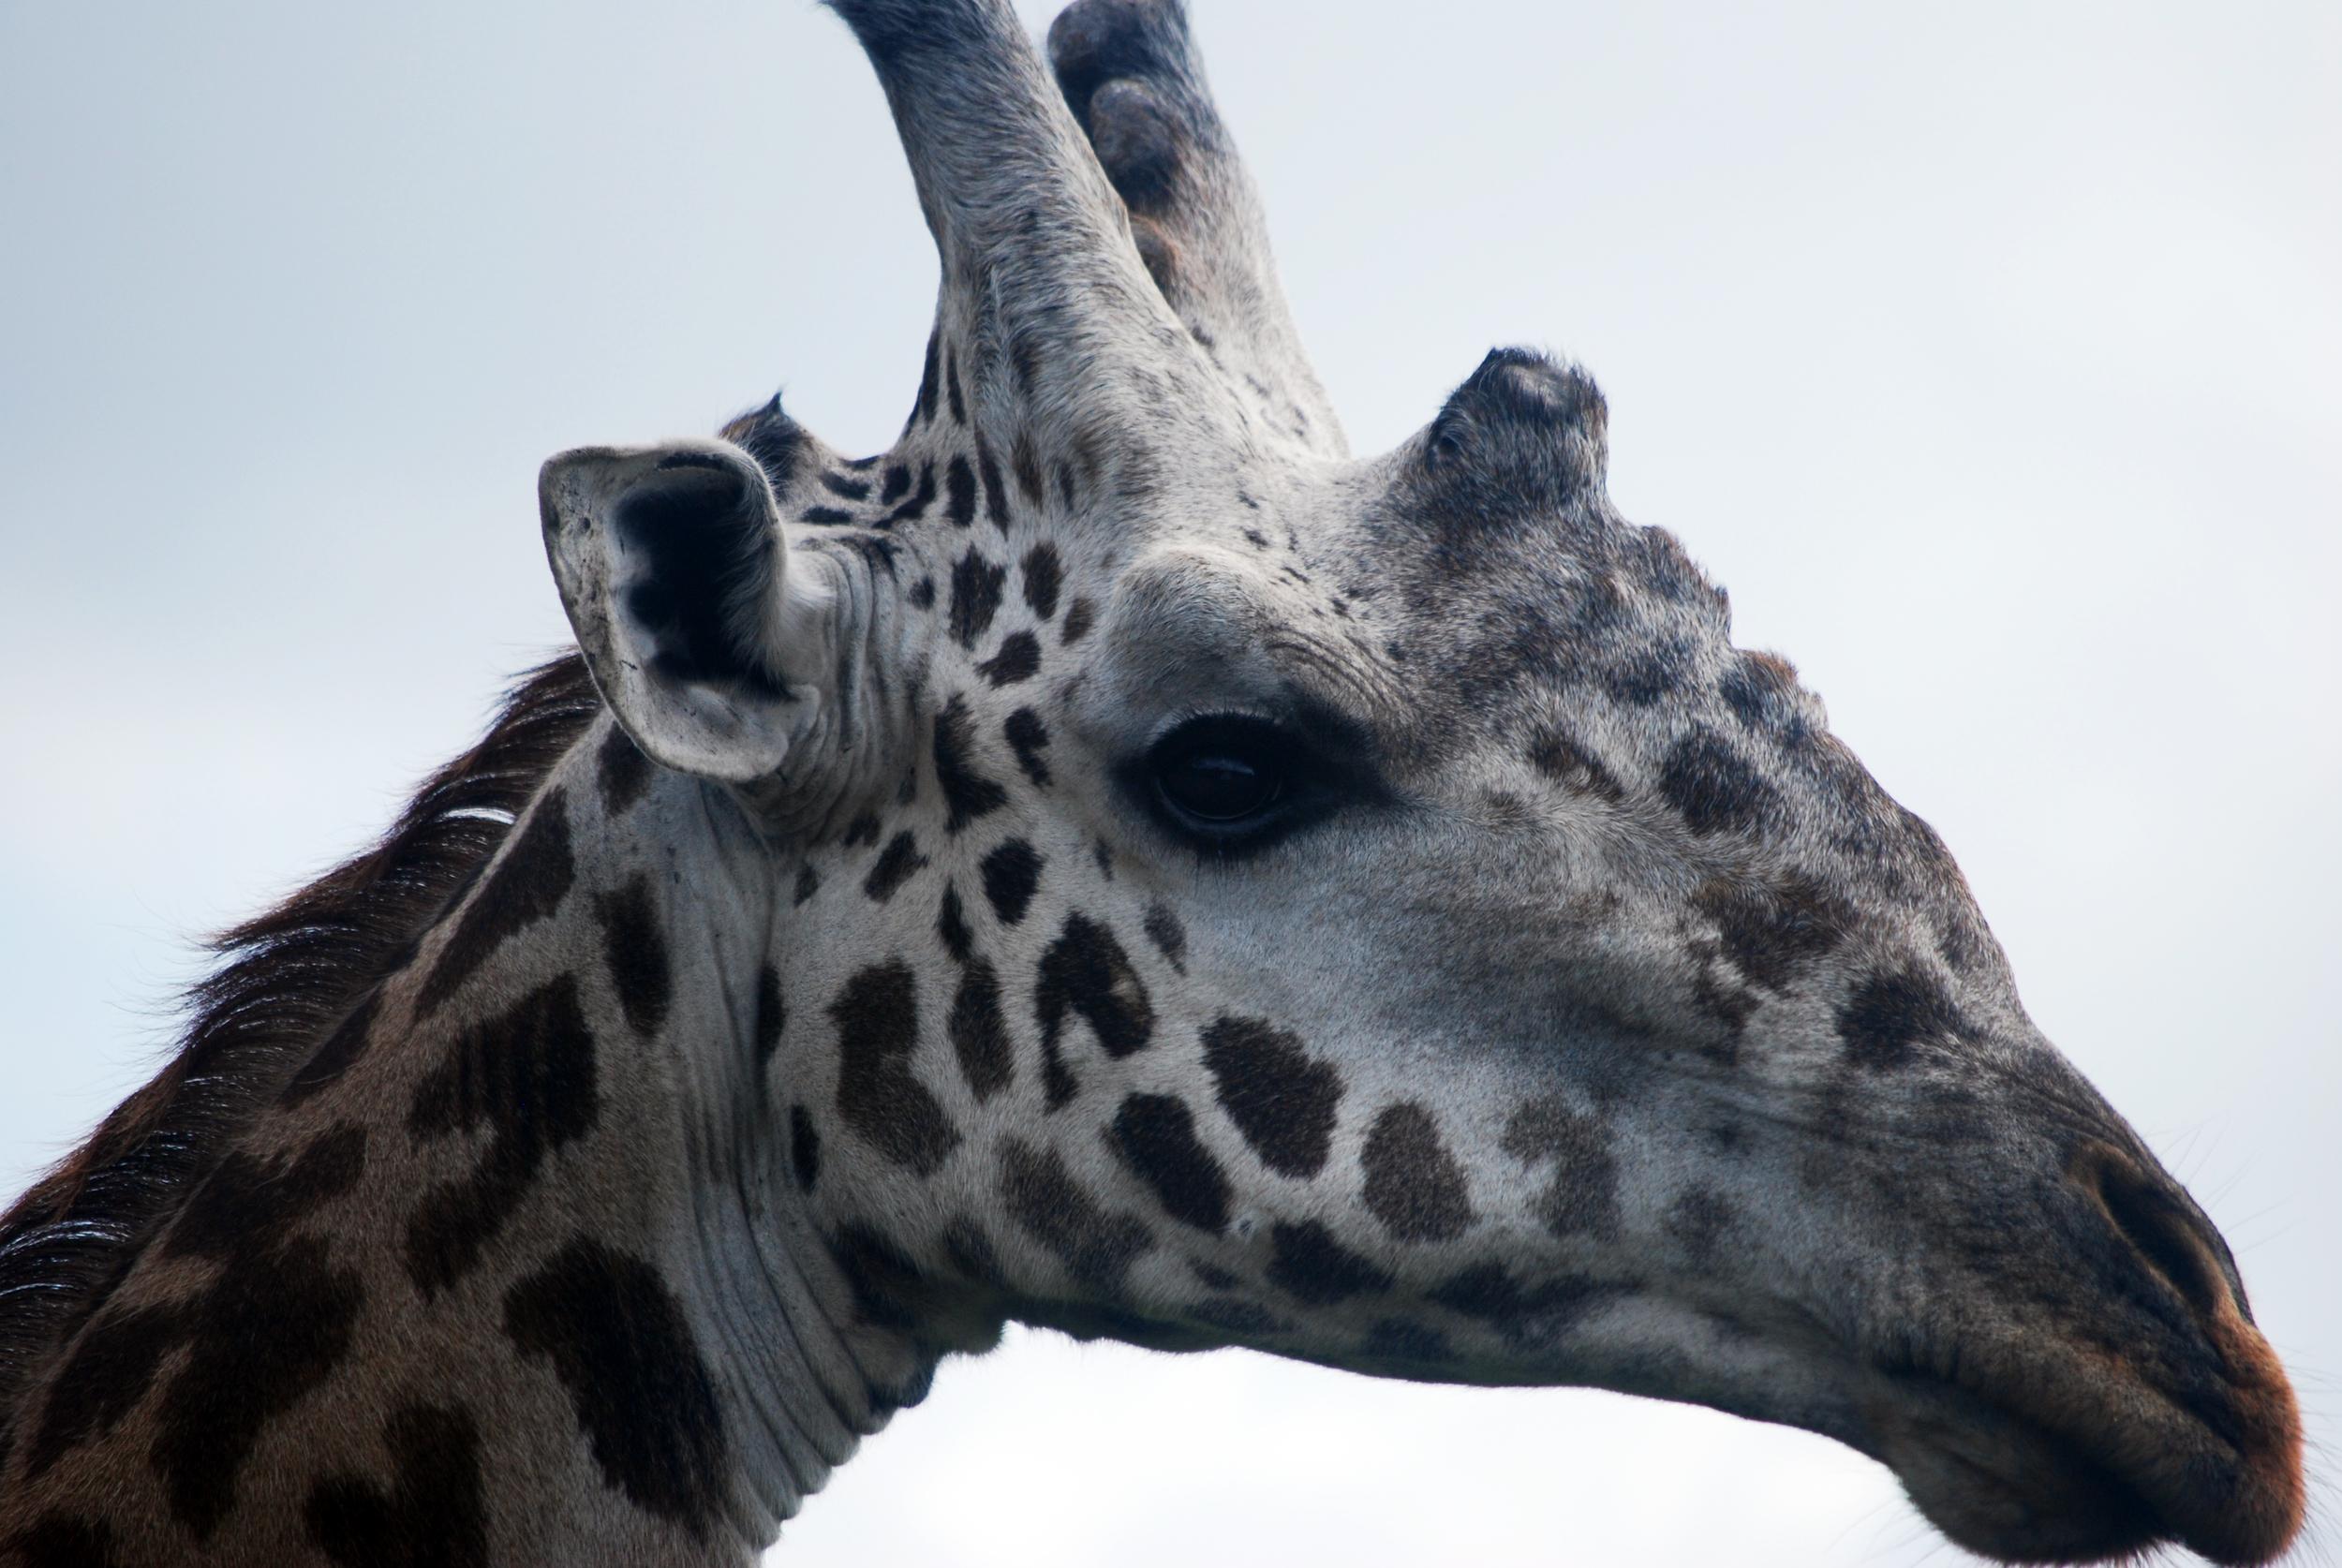 Portrait of giraffe. Nairobi National Park, Kenya, 2013.